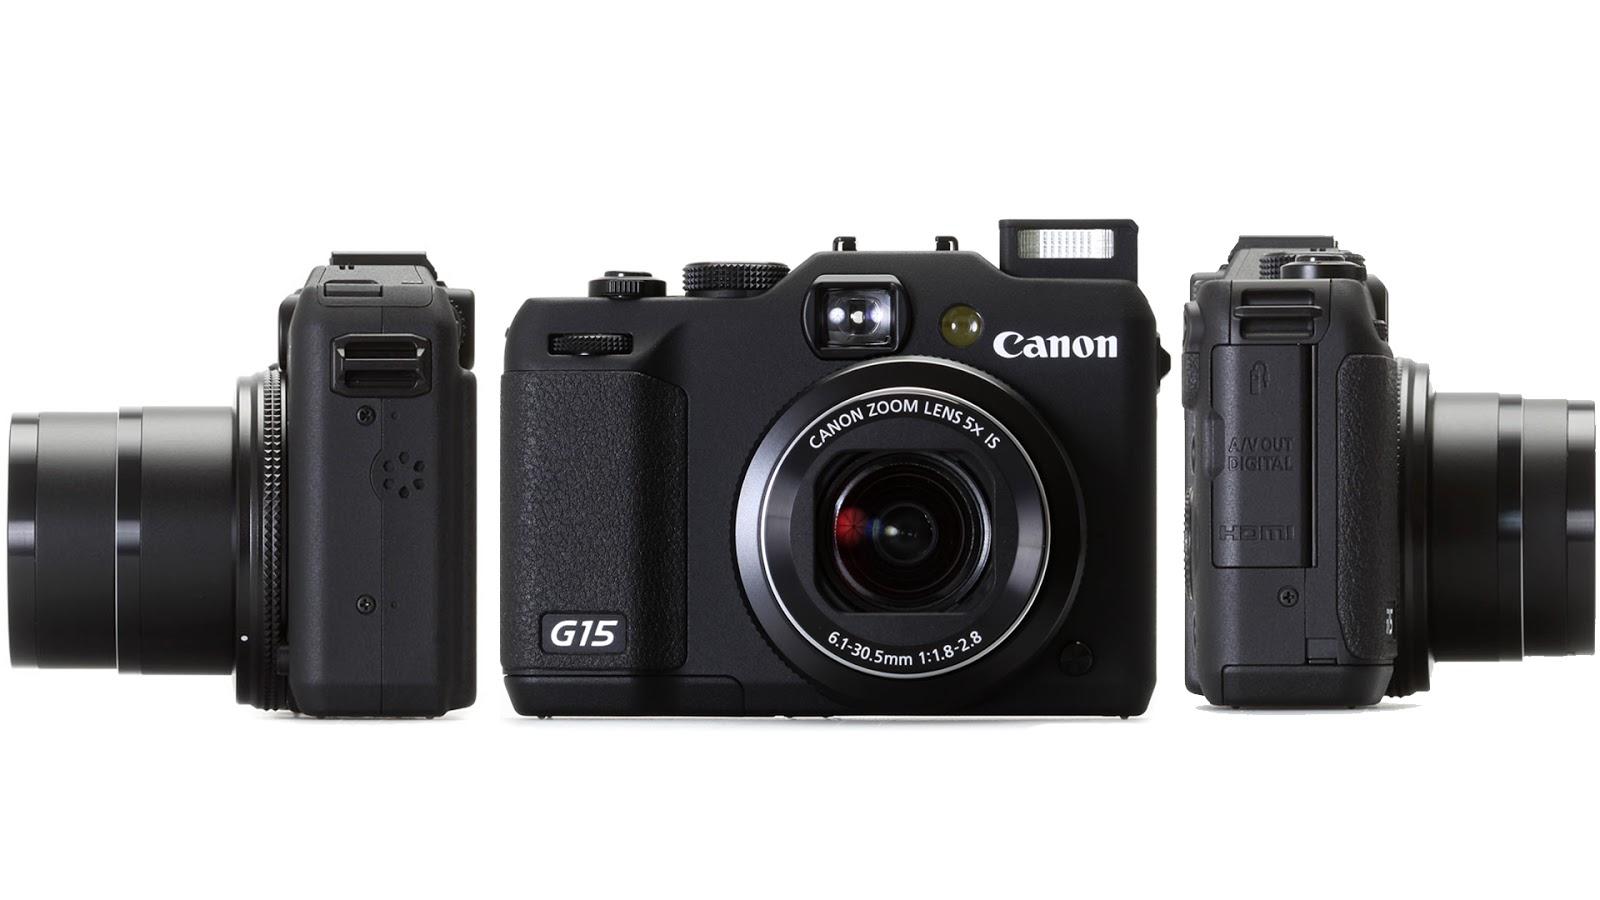 canon powershot g15 digital camera review. Black Bedroom Furniture Sets. Home Design Ideas